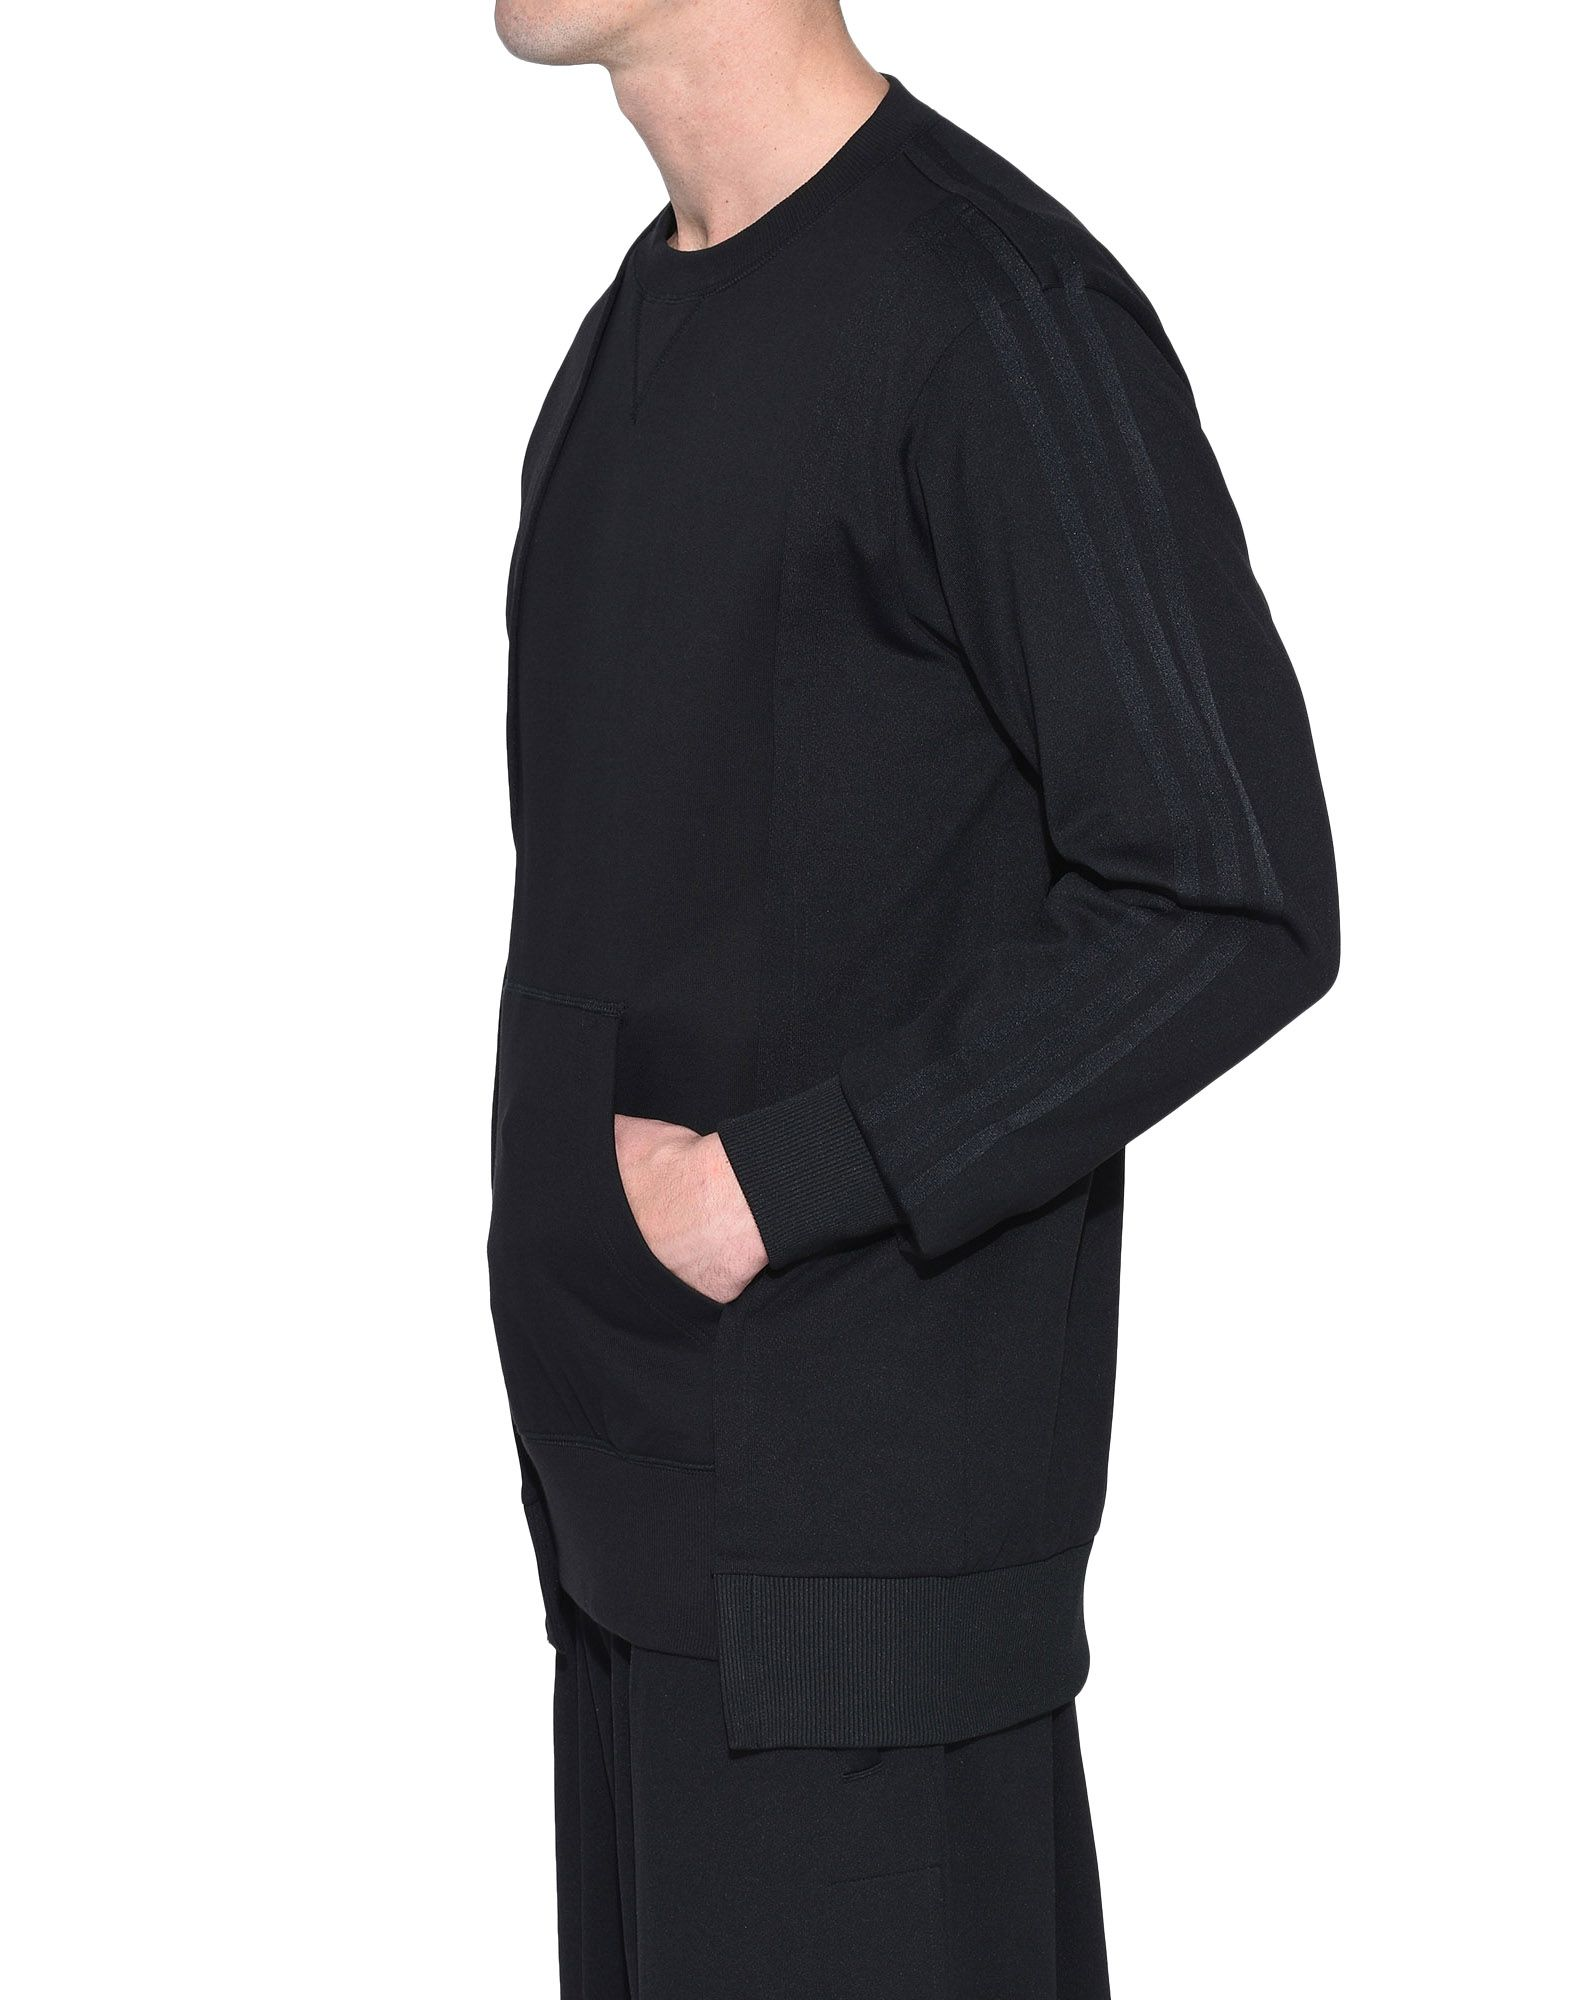 Y-3 Y-3 Patchwork Sweater Sweatshirt Man e